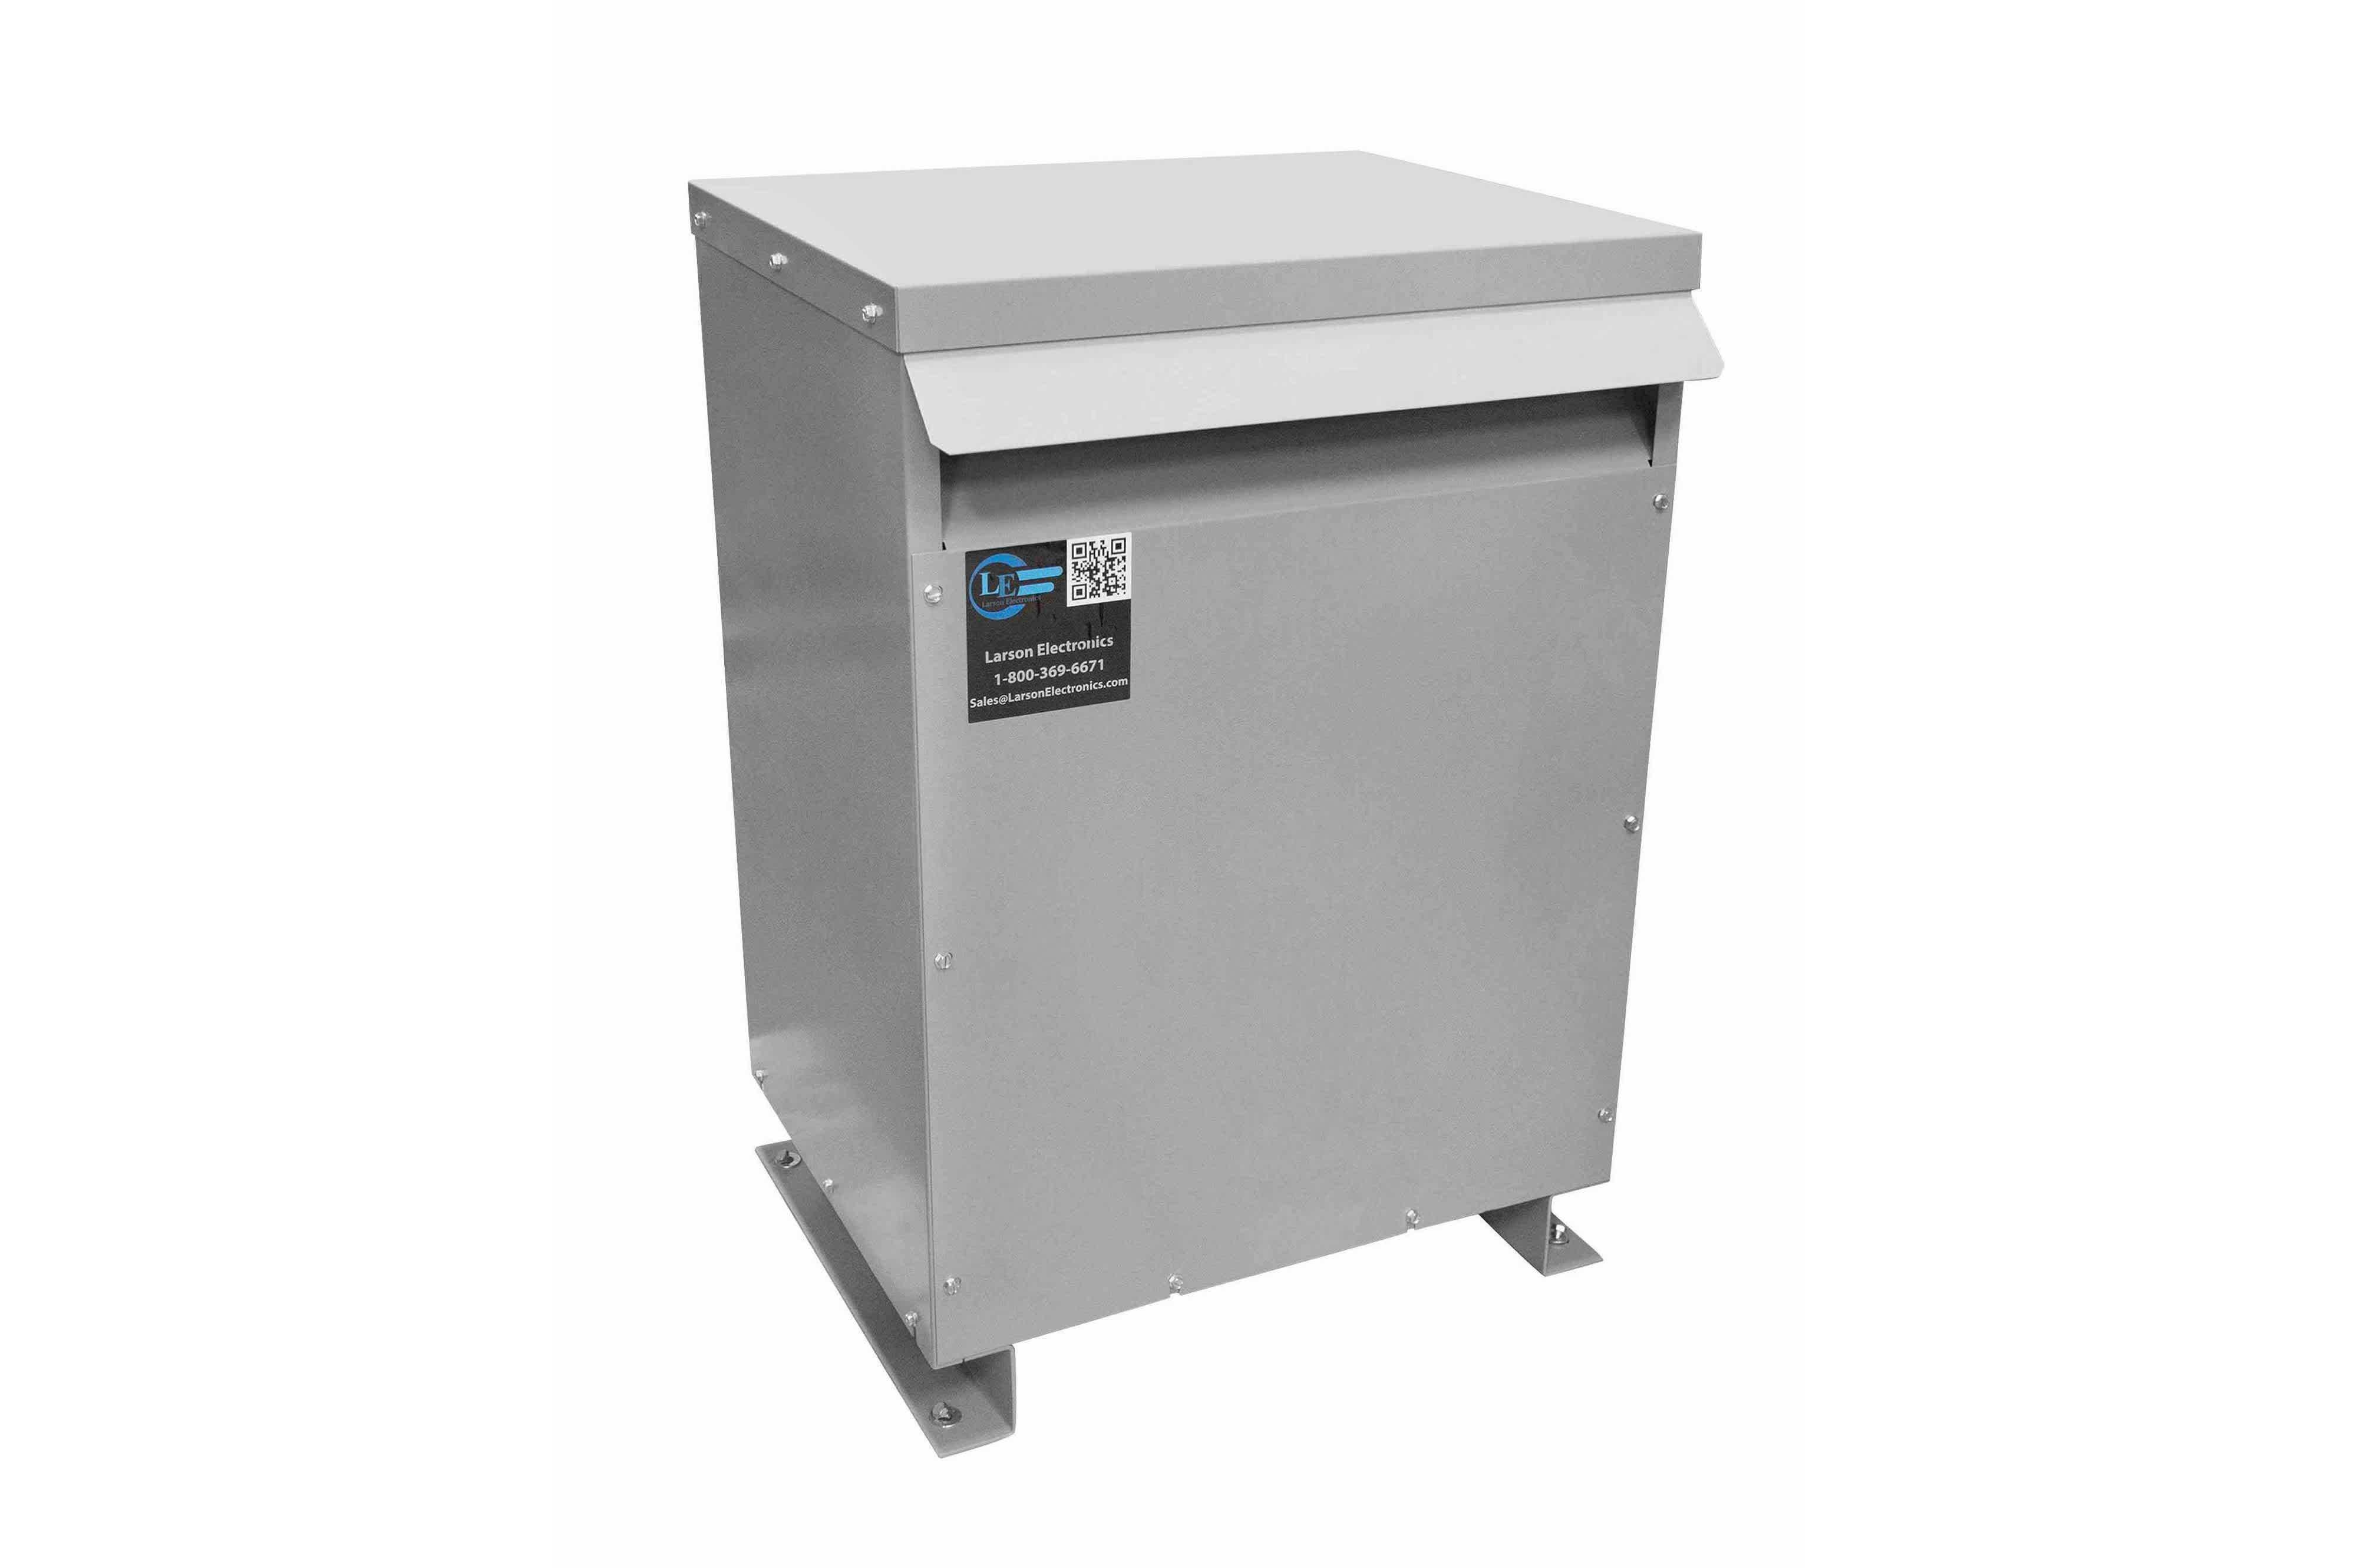 35 kVA 3PH Isolation Transformer, 415V Wye Primary, 240V/120 Delta Secondary, N3R, Ventilated, 60 Hz